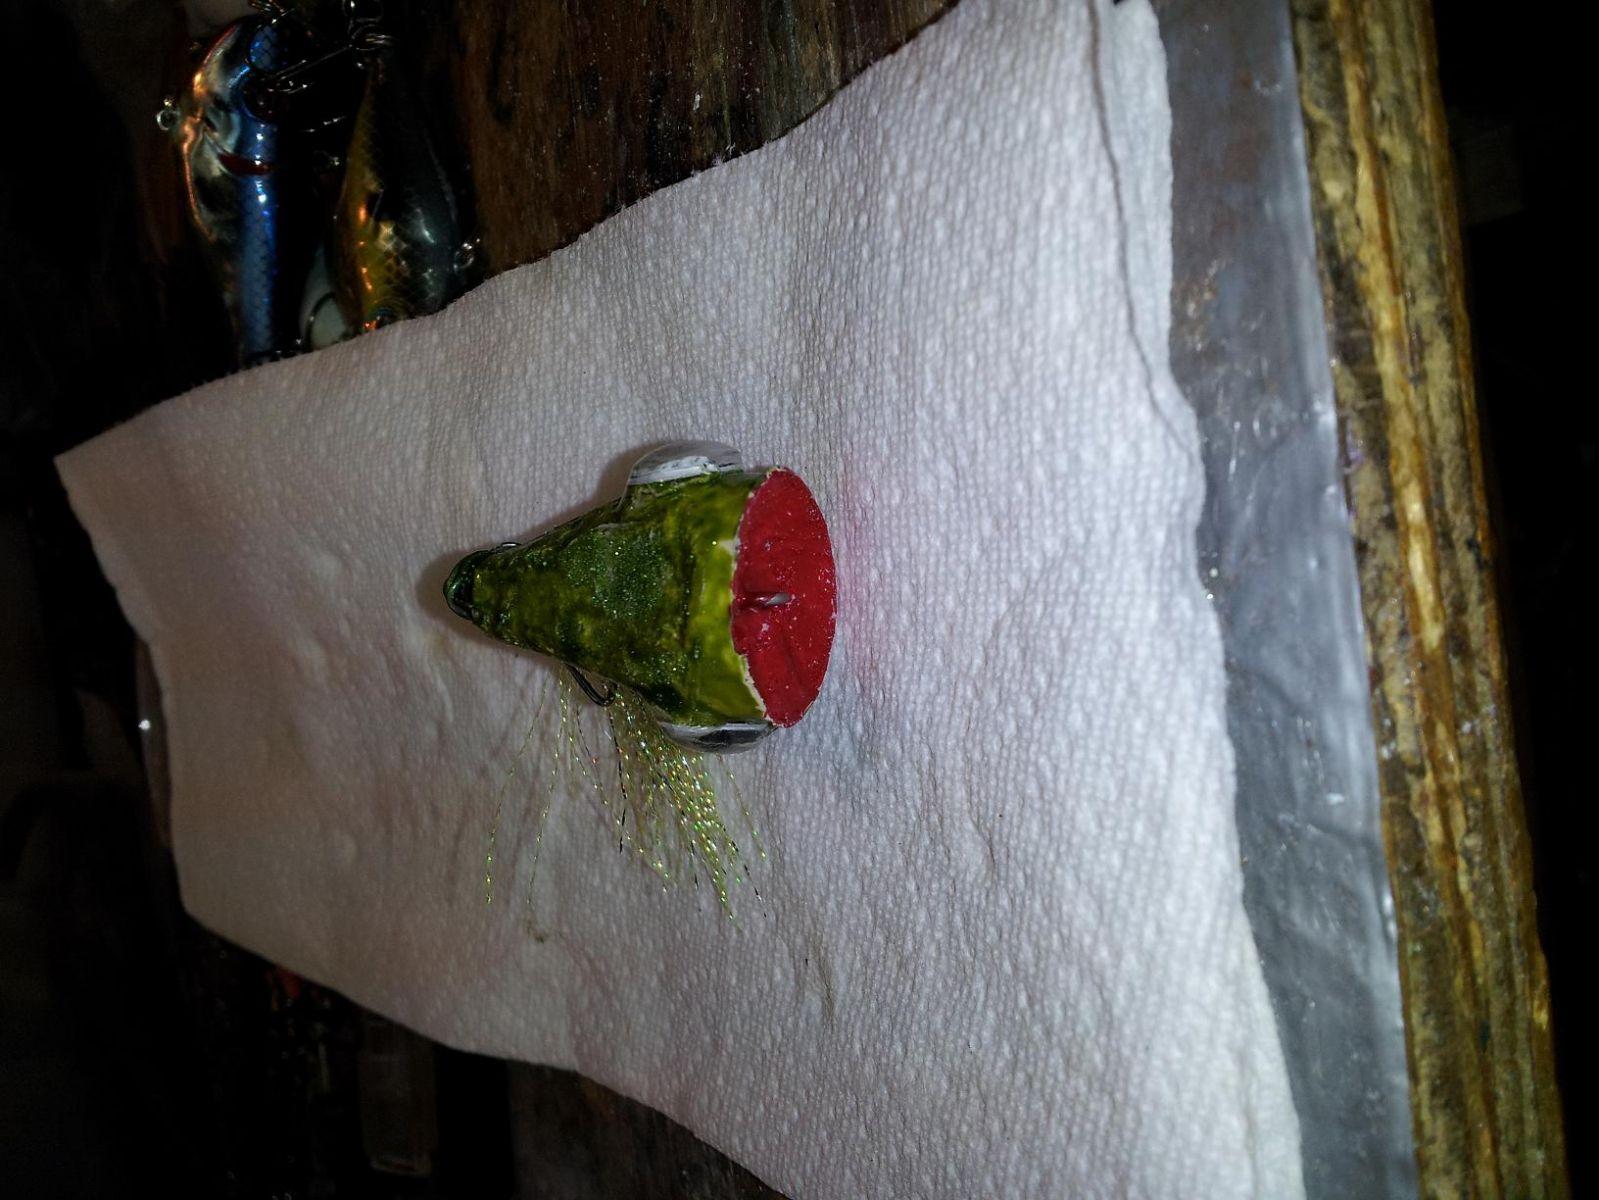 cork frog2 8 4 13